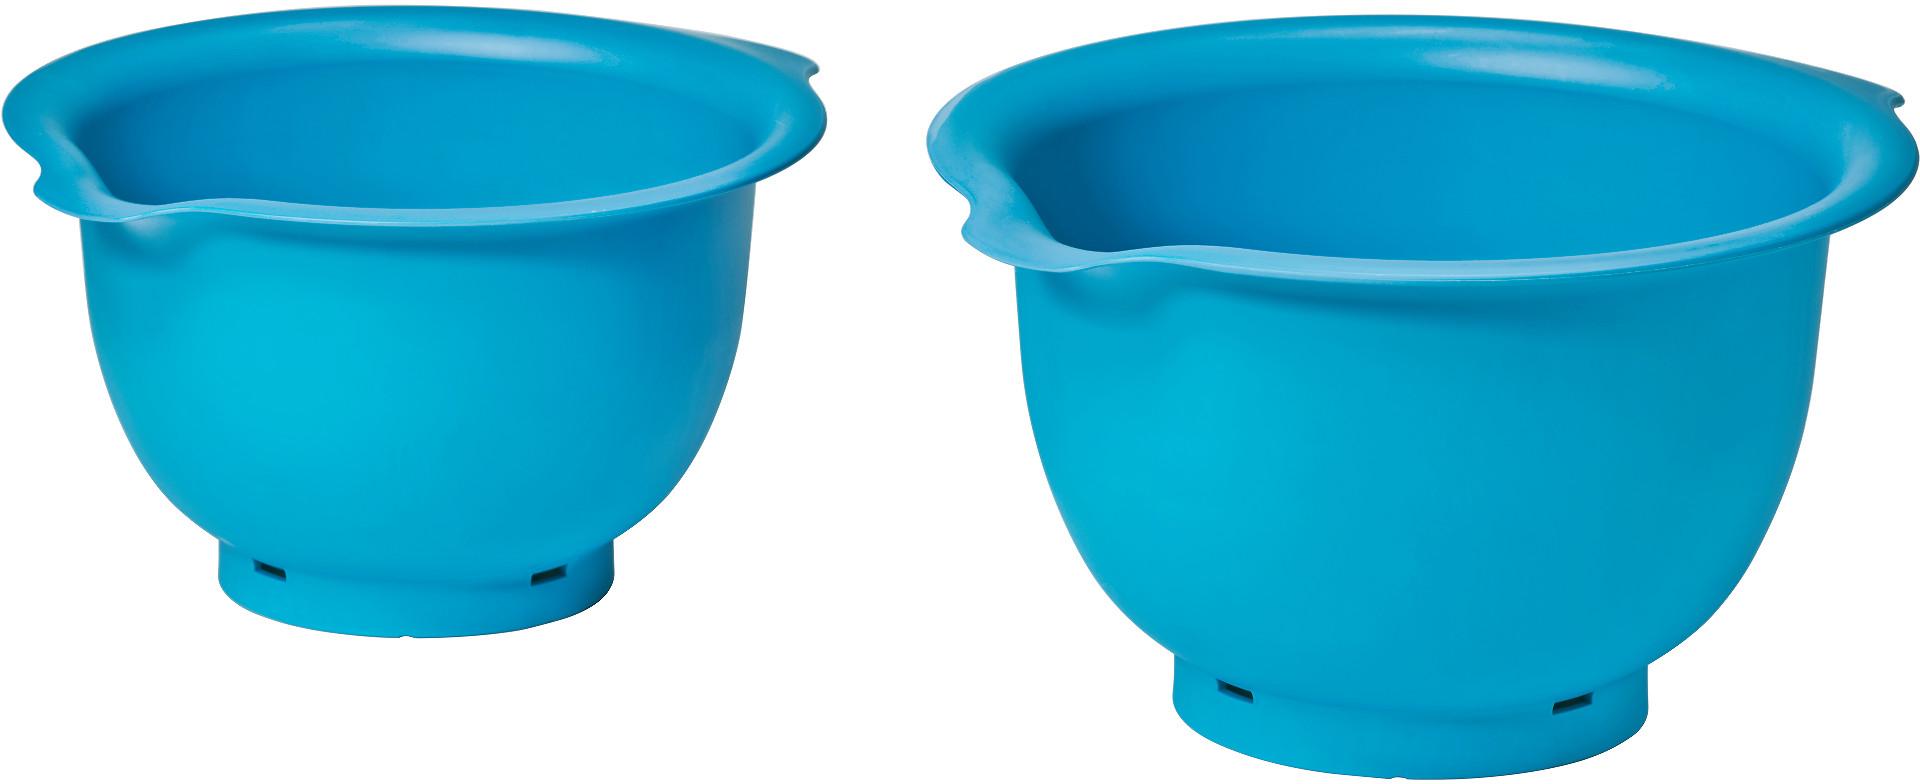 VISPAD Mixing bowl, set of 2 - IKEA